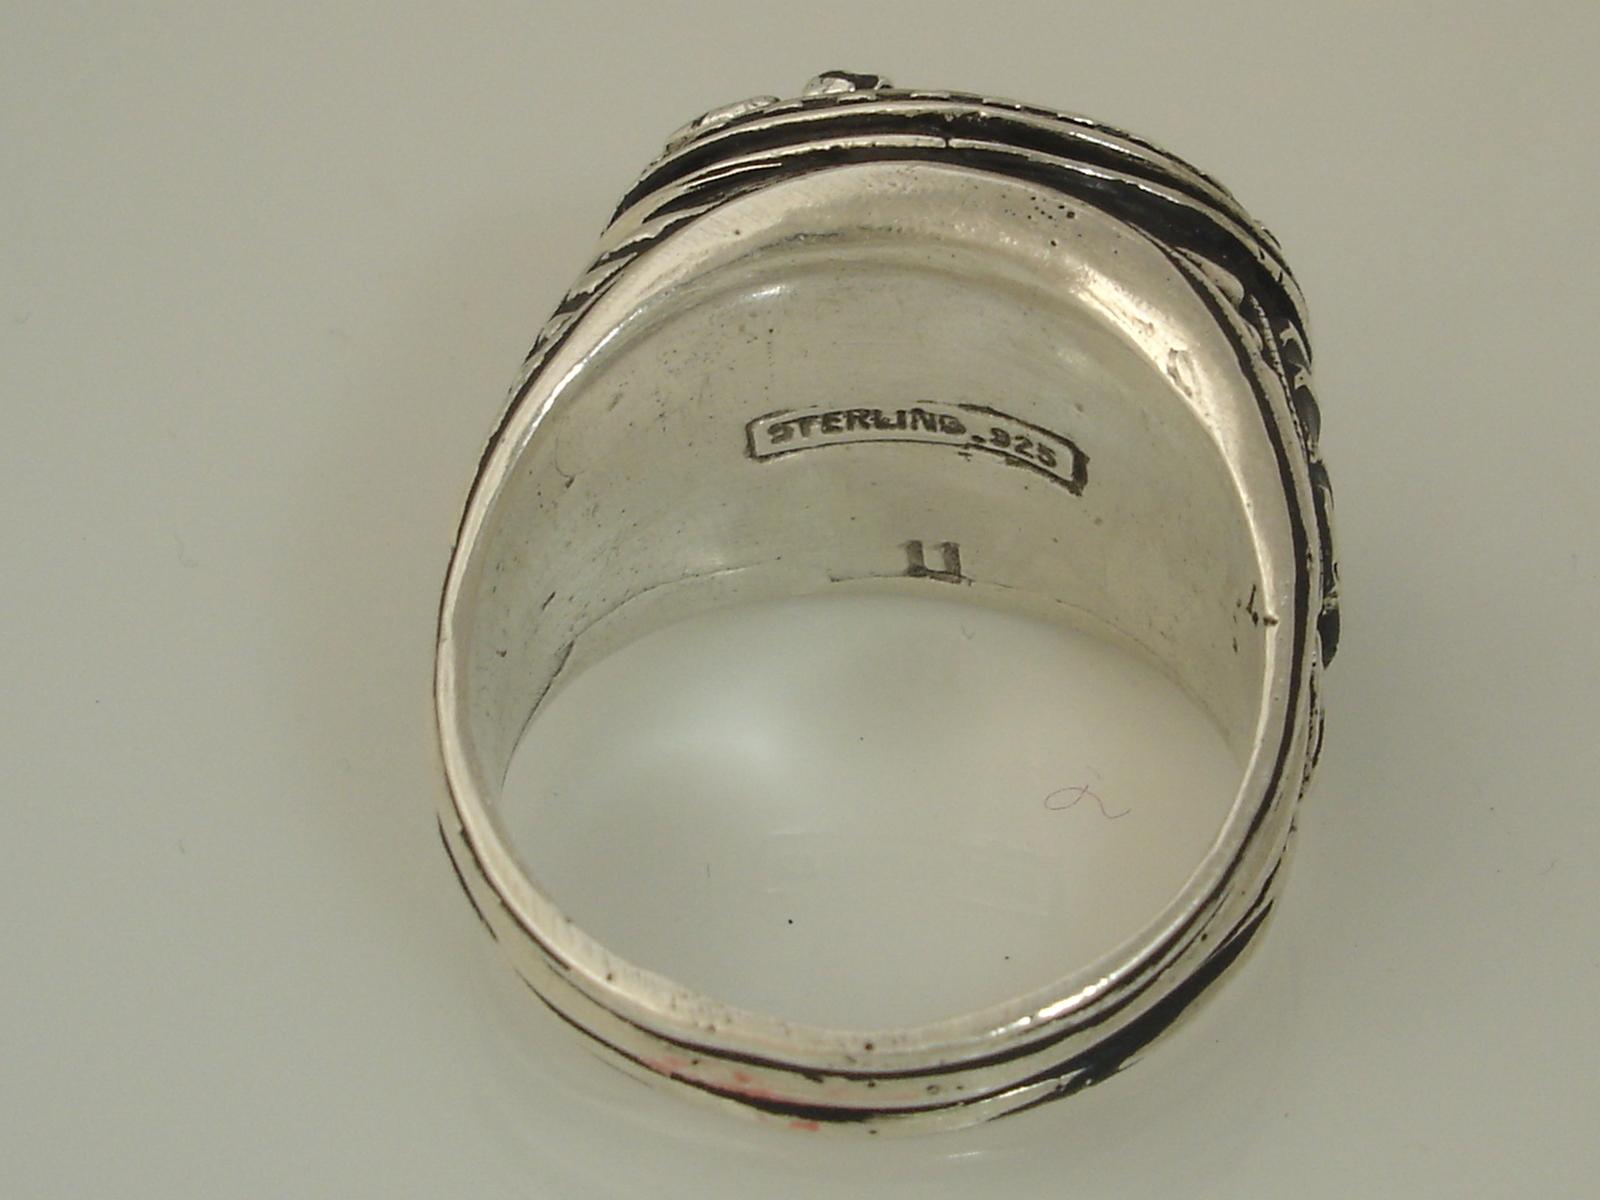 Roman Centurion Men's Signet ring,,Sterling Silver,Lg.